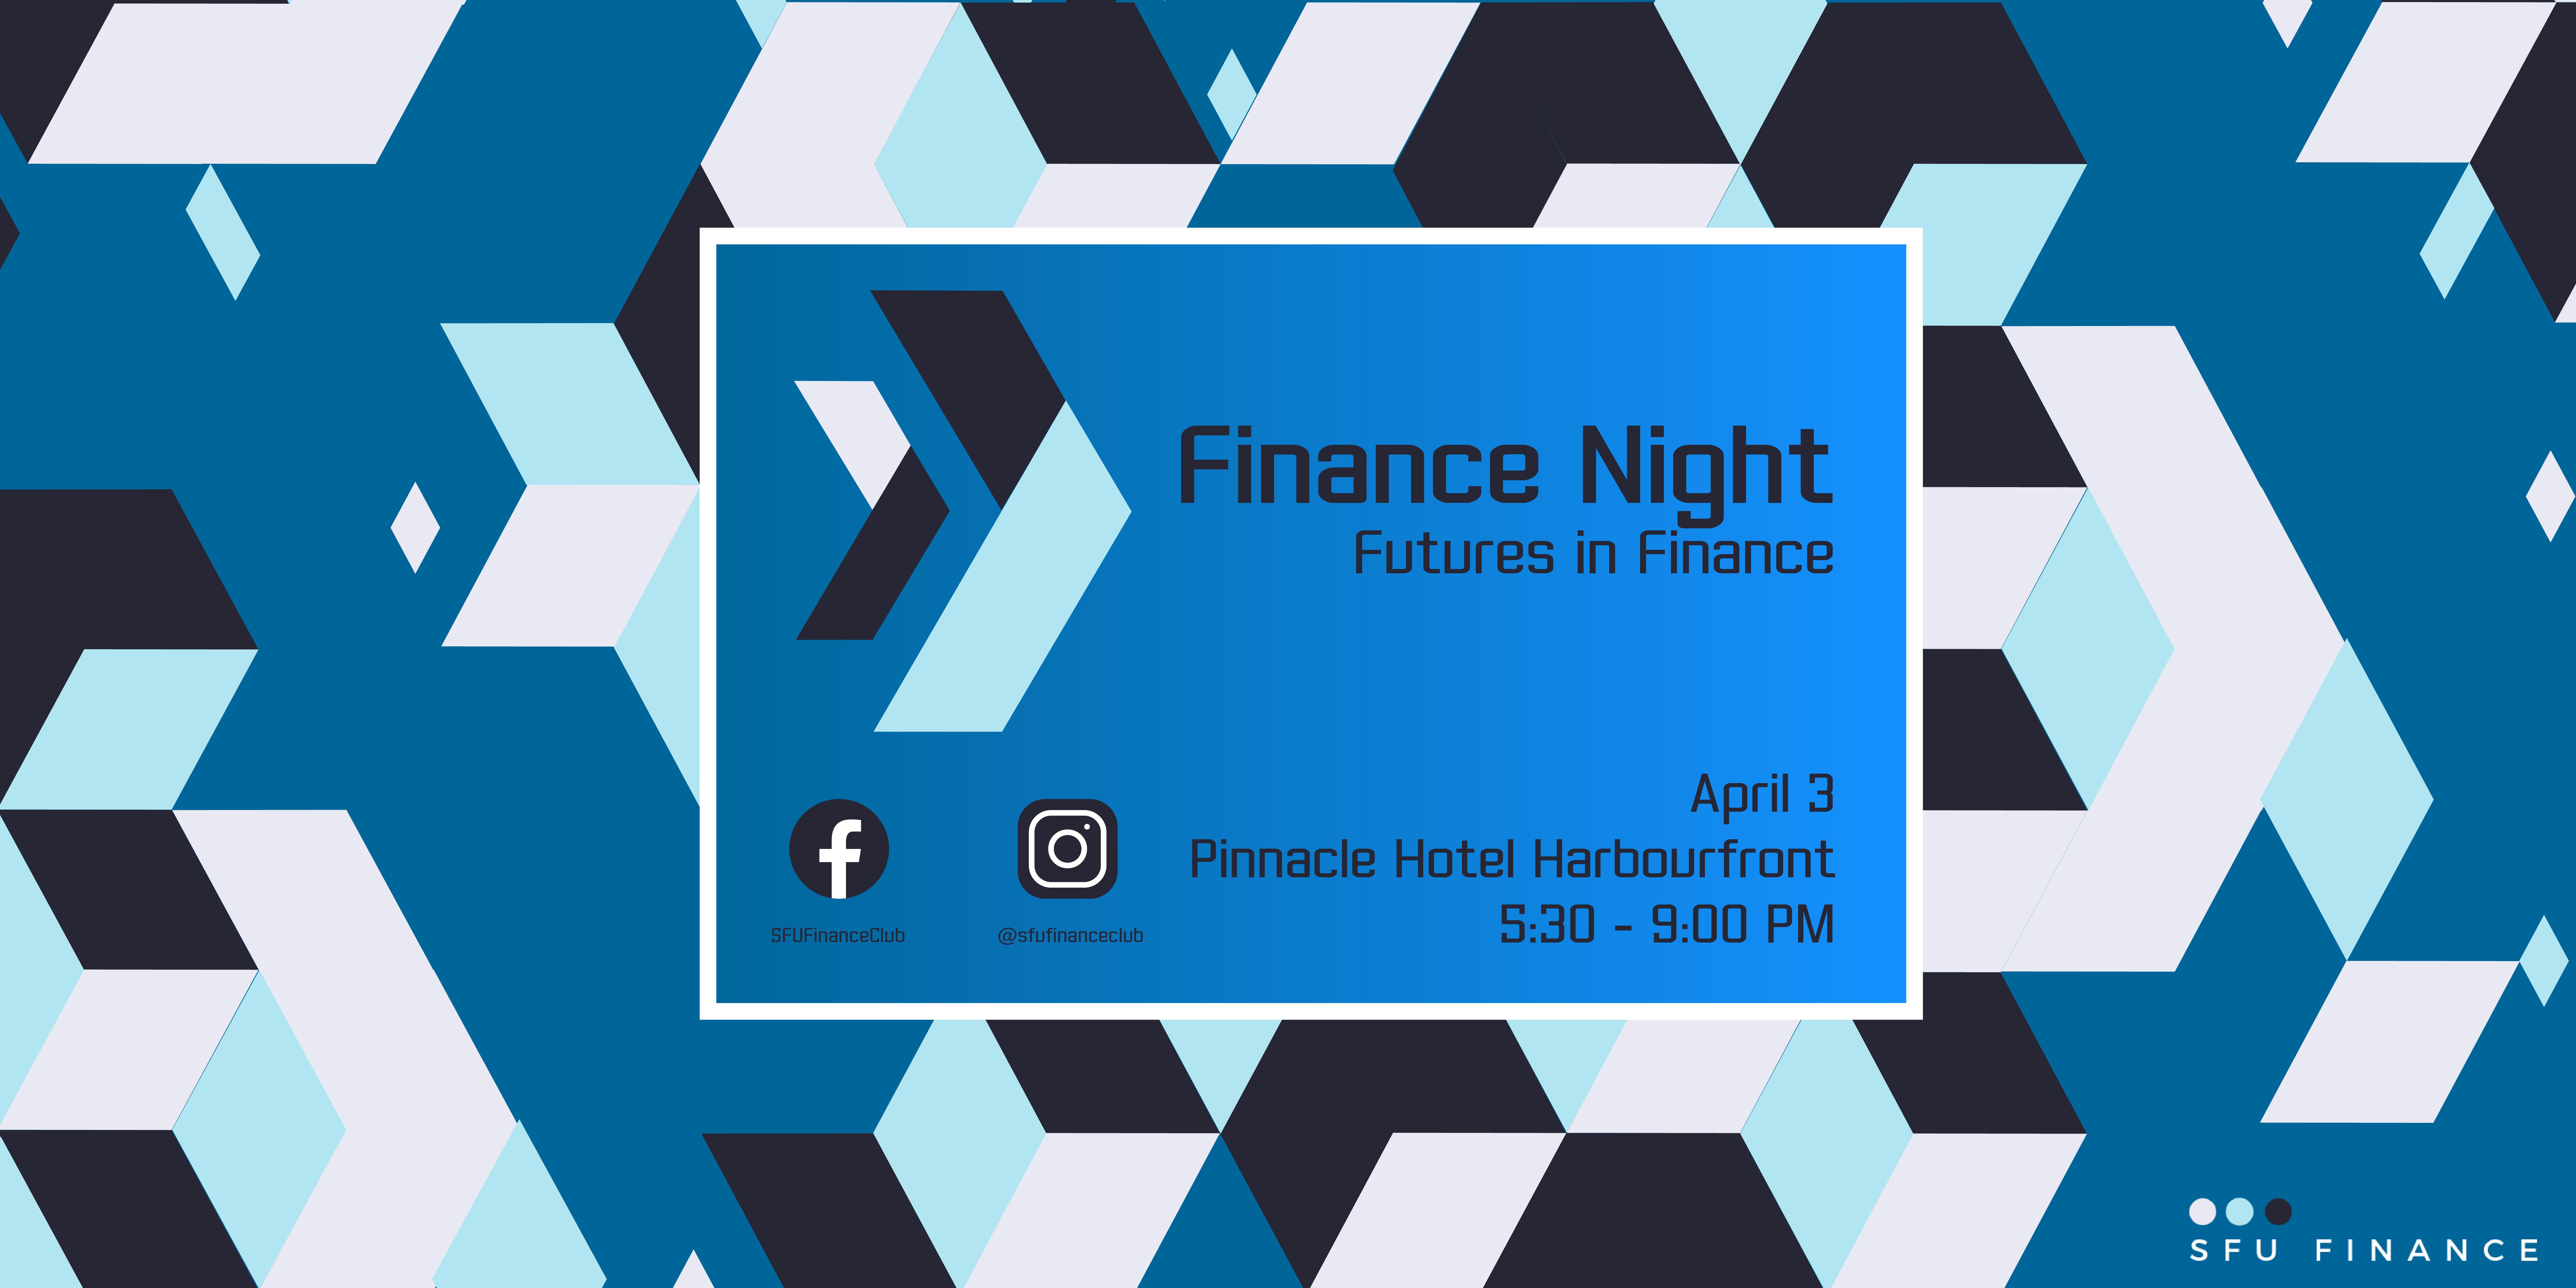 Finance Night: Futures in Finance